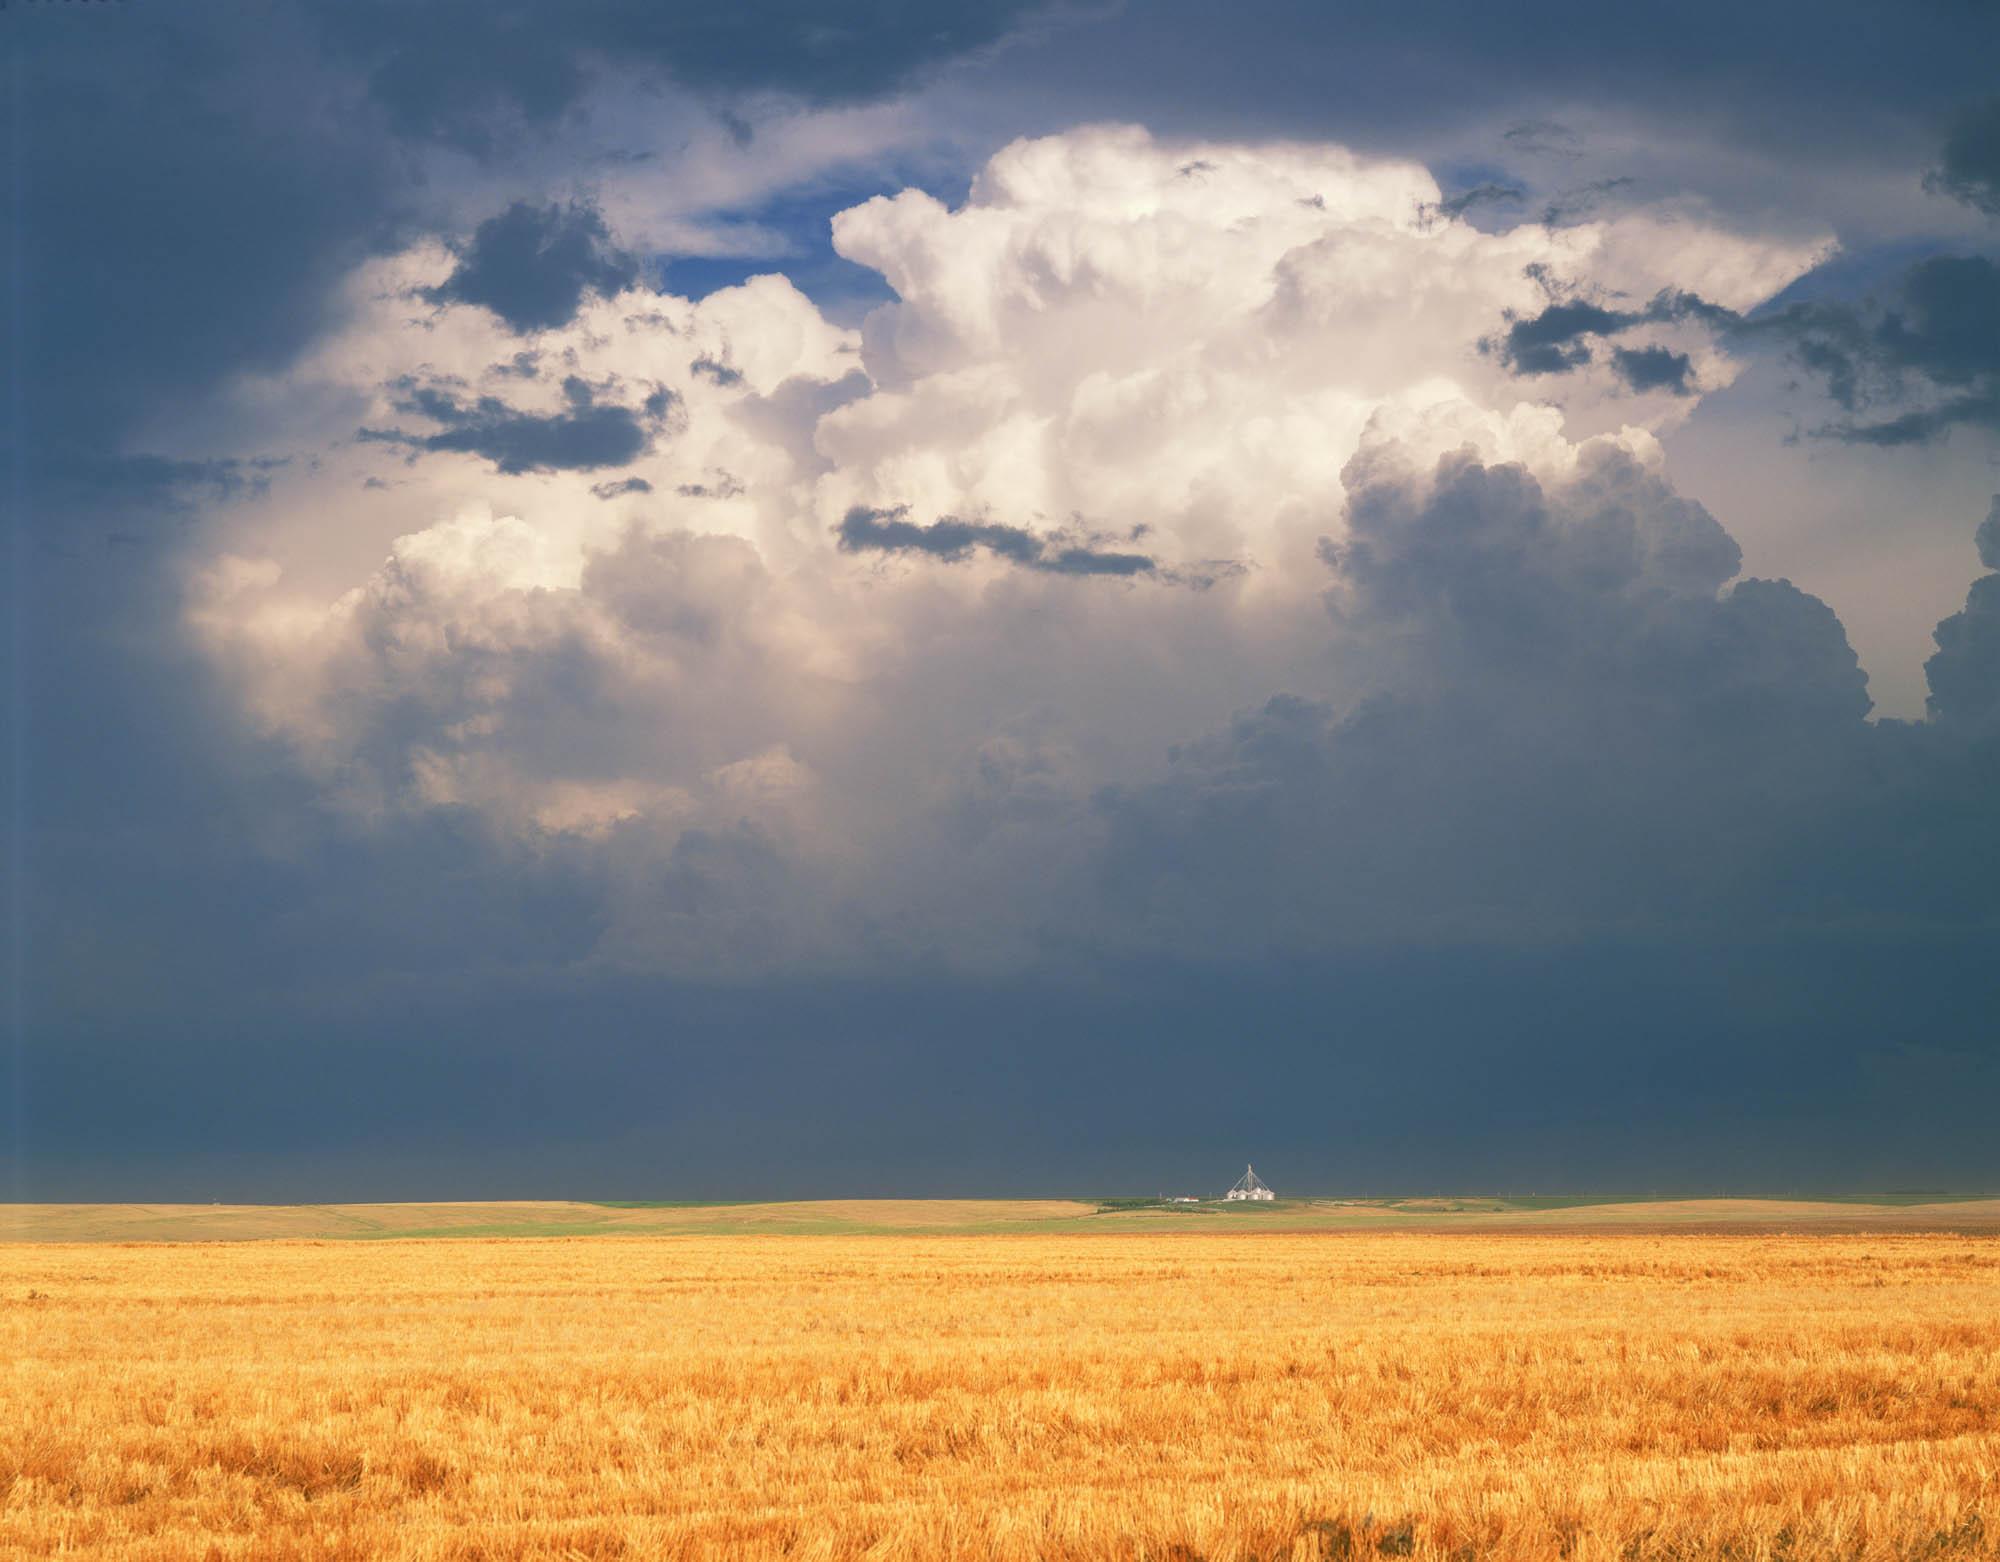 Great-Plains-Thunderstorm-Colorado-John-Fielder.jpg